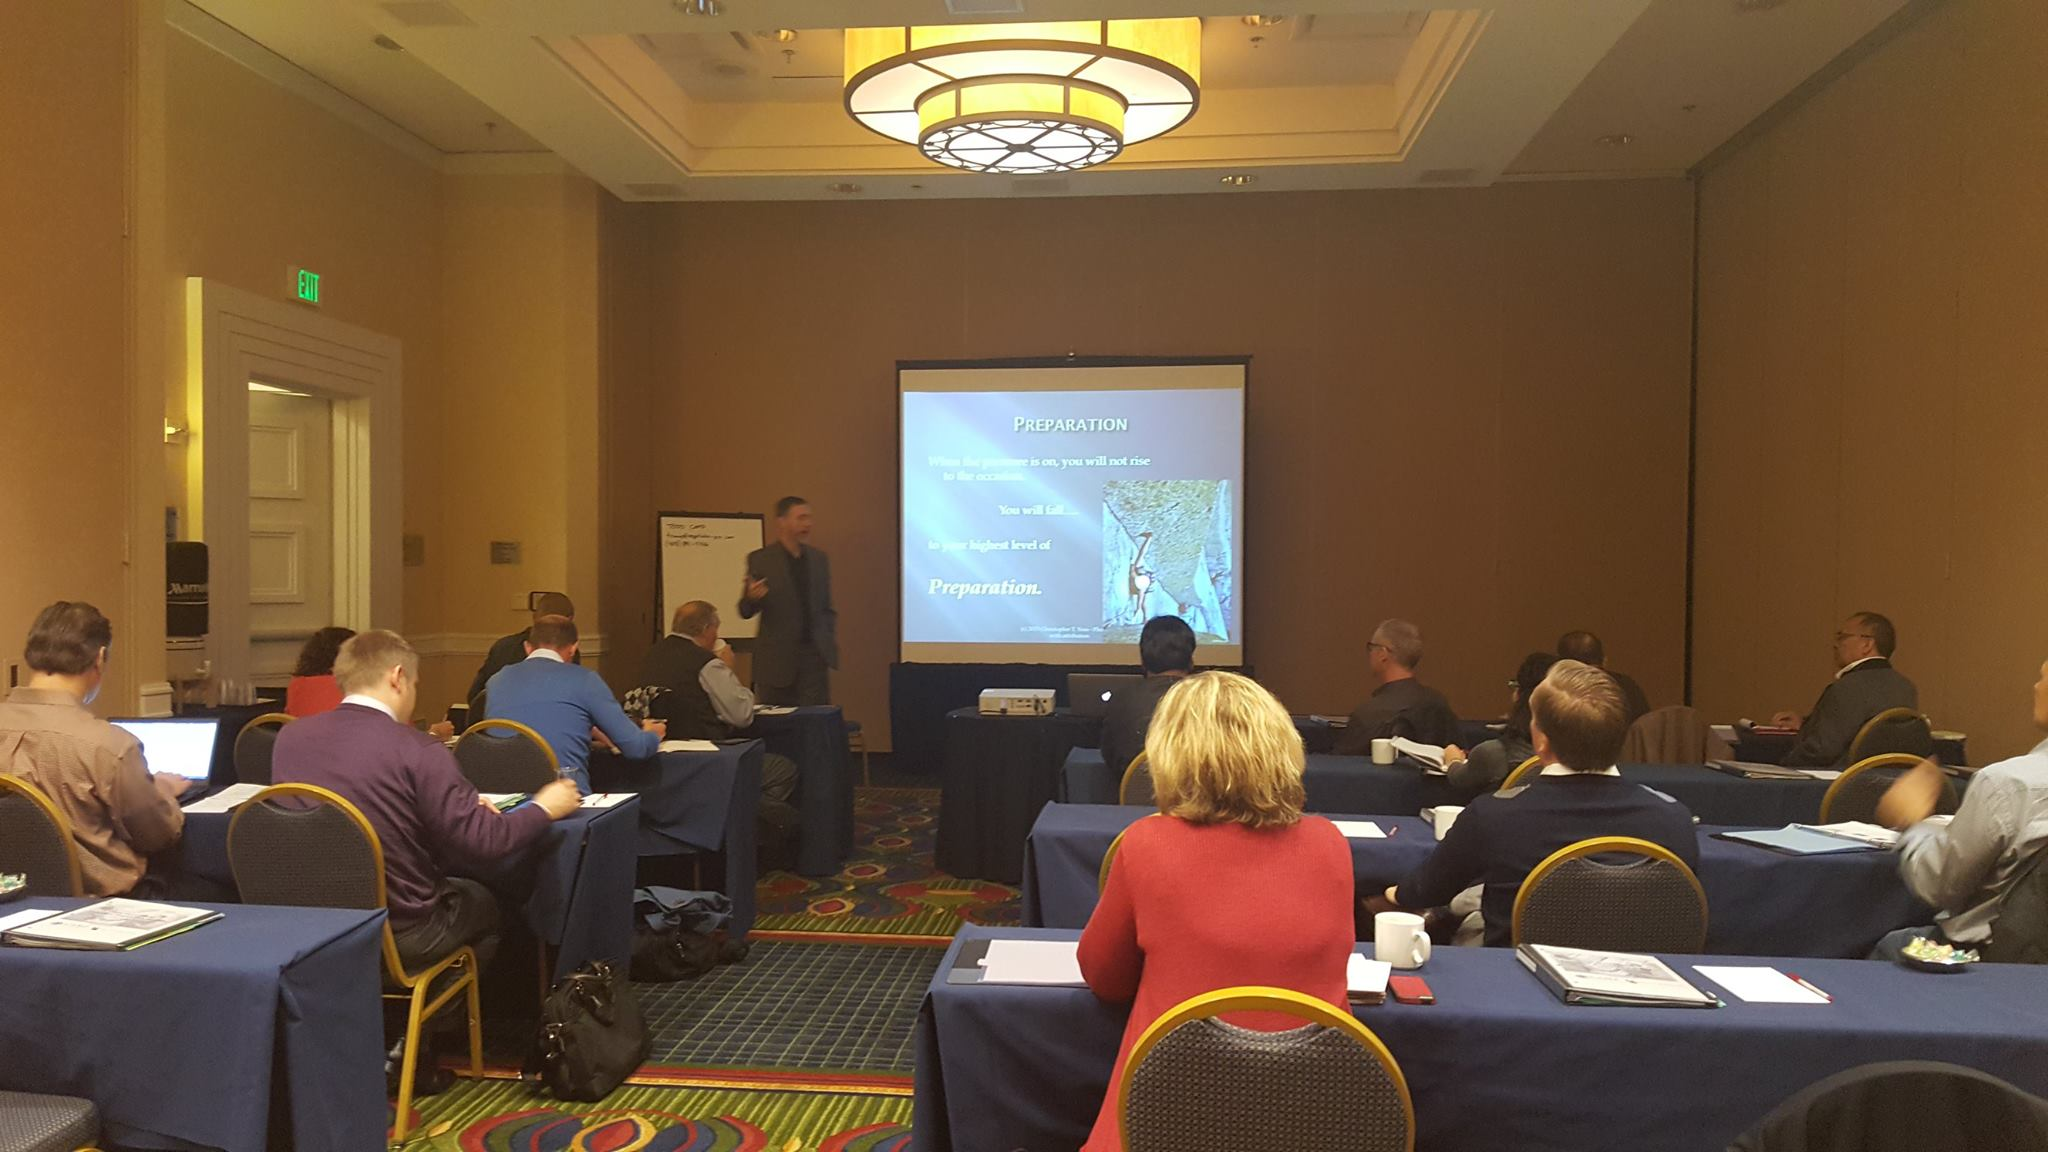 Chris Voss, live negotiation training